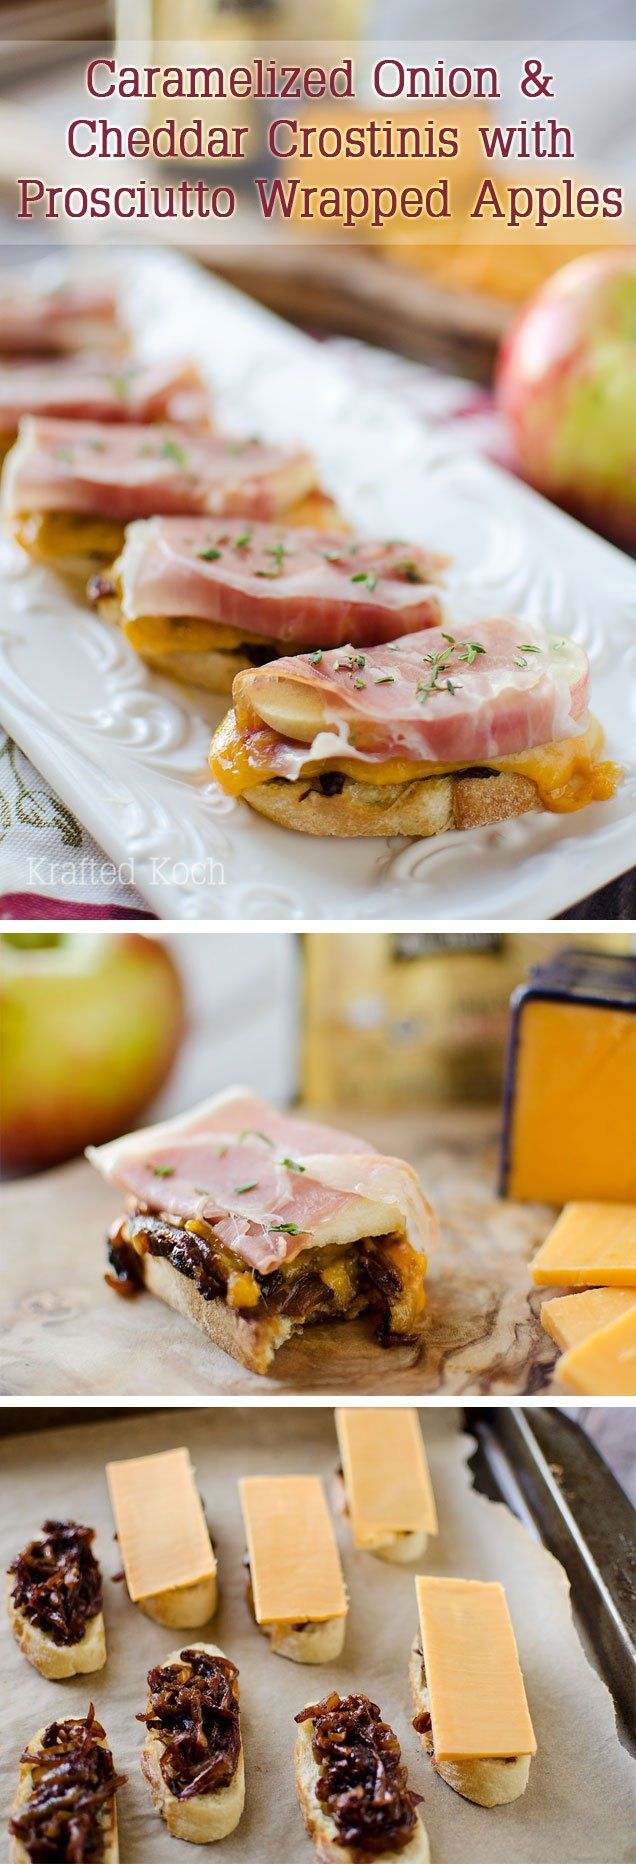 ... Bruschetta & Crostini on Pinterest | Bruschetta, Goat cheese and Basil